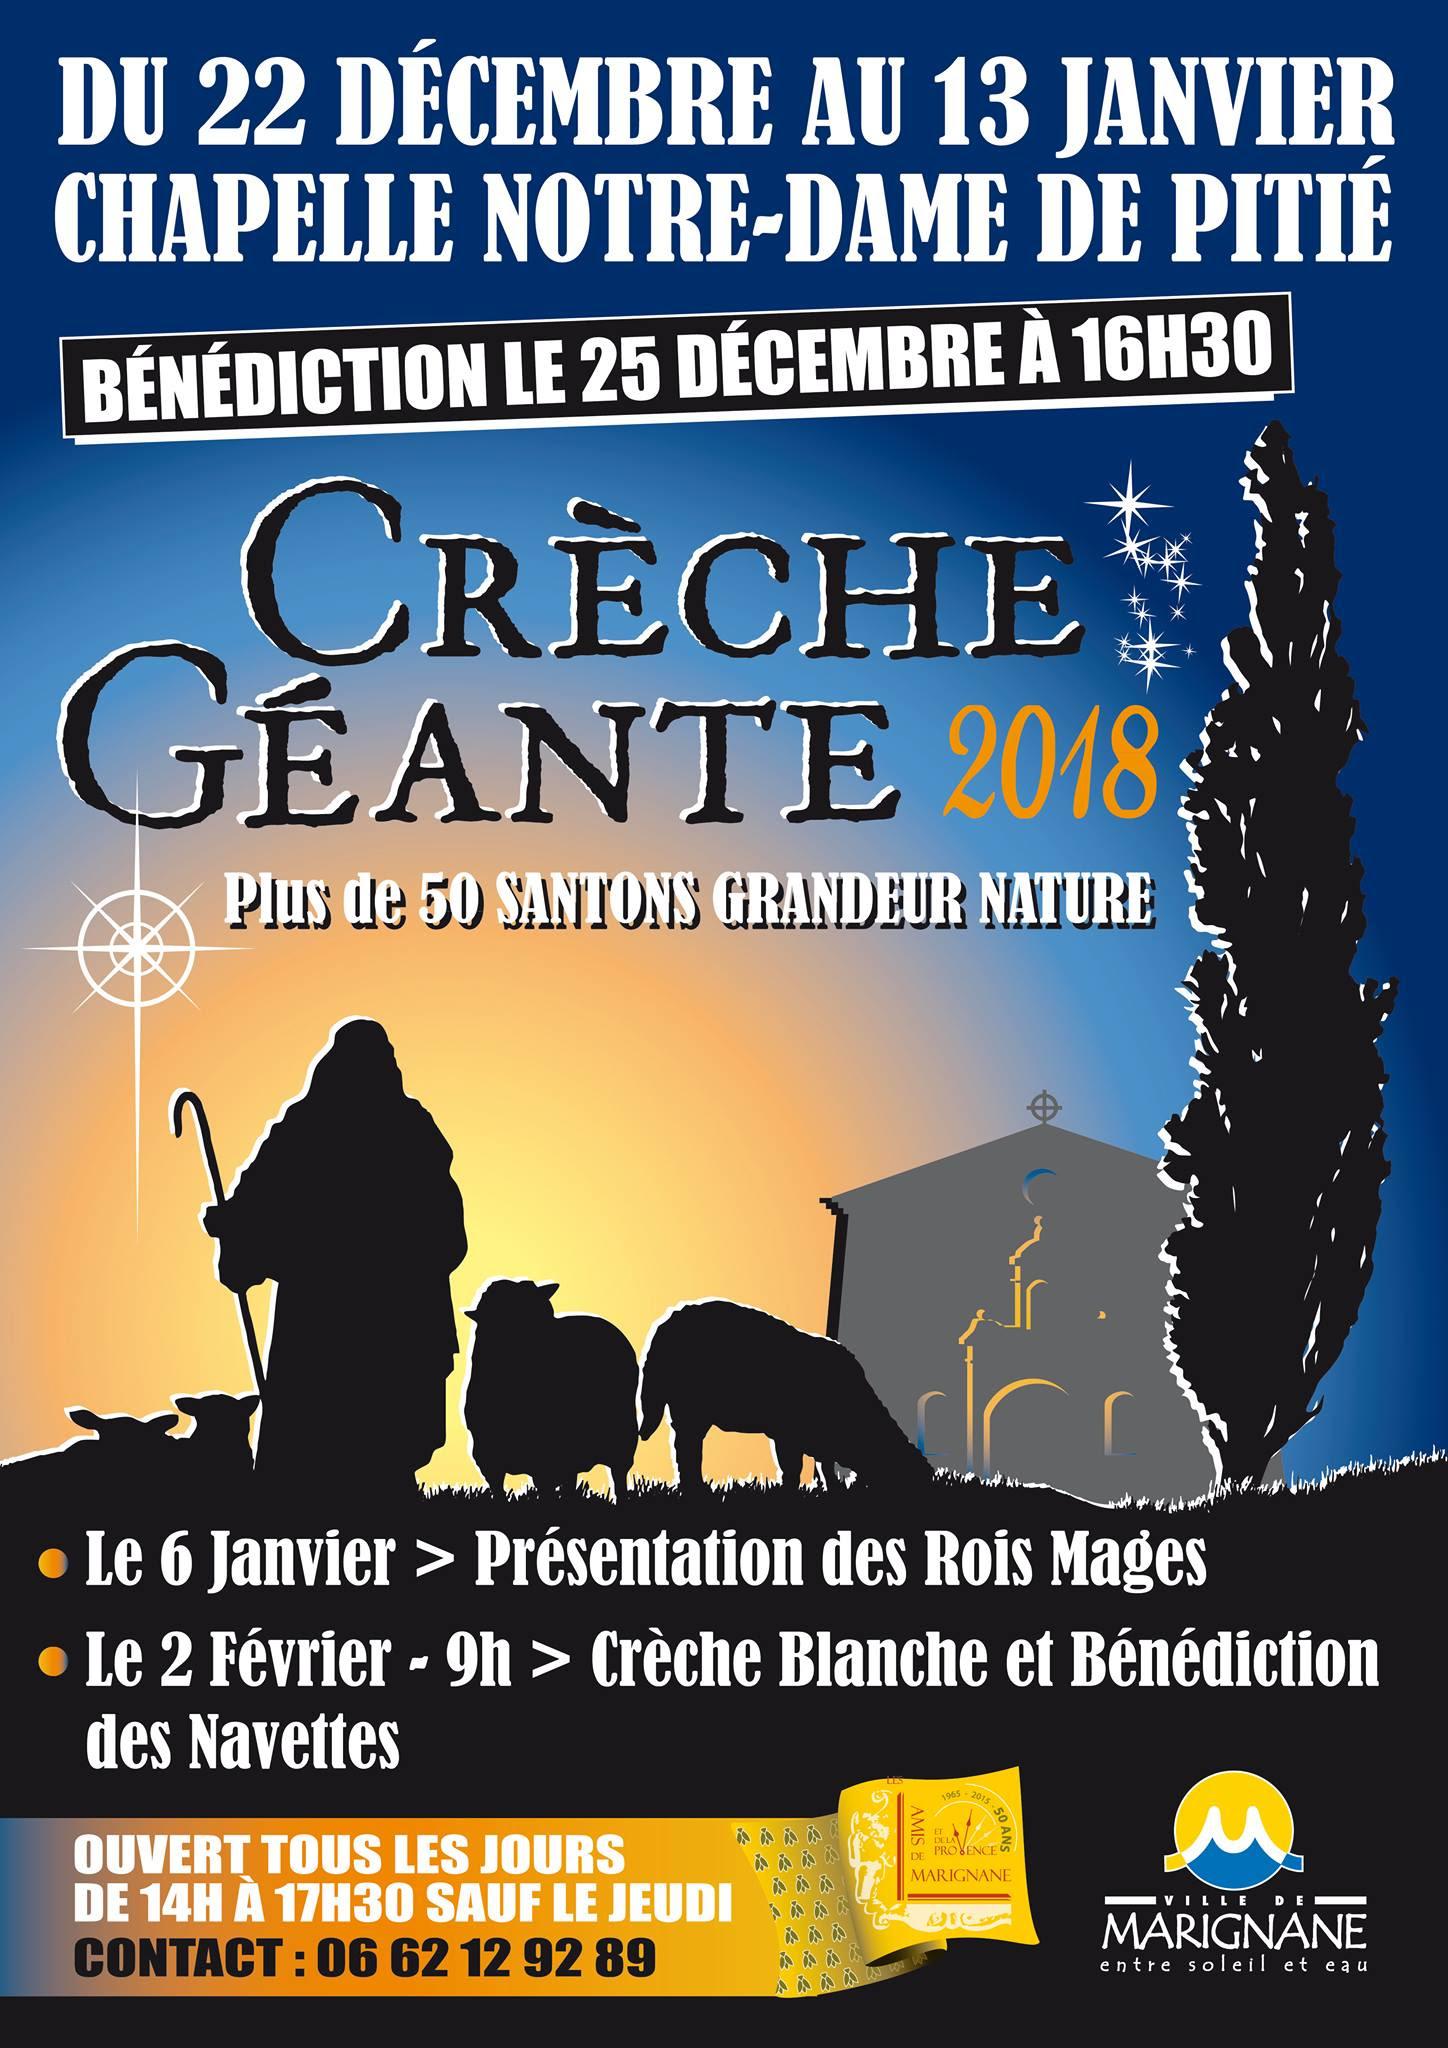 creche géante 2018 Marignane